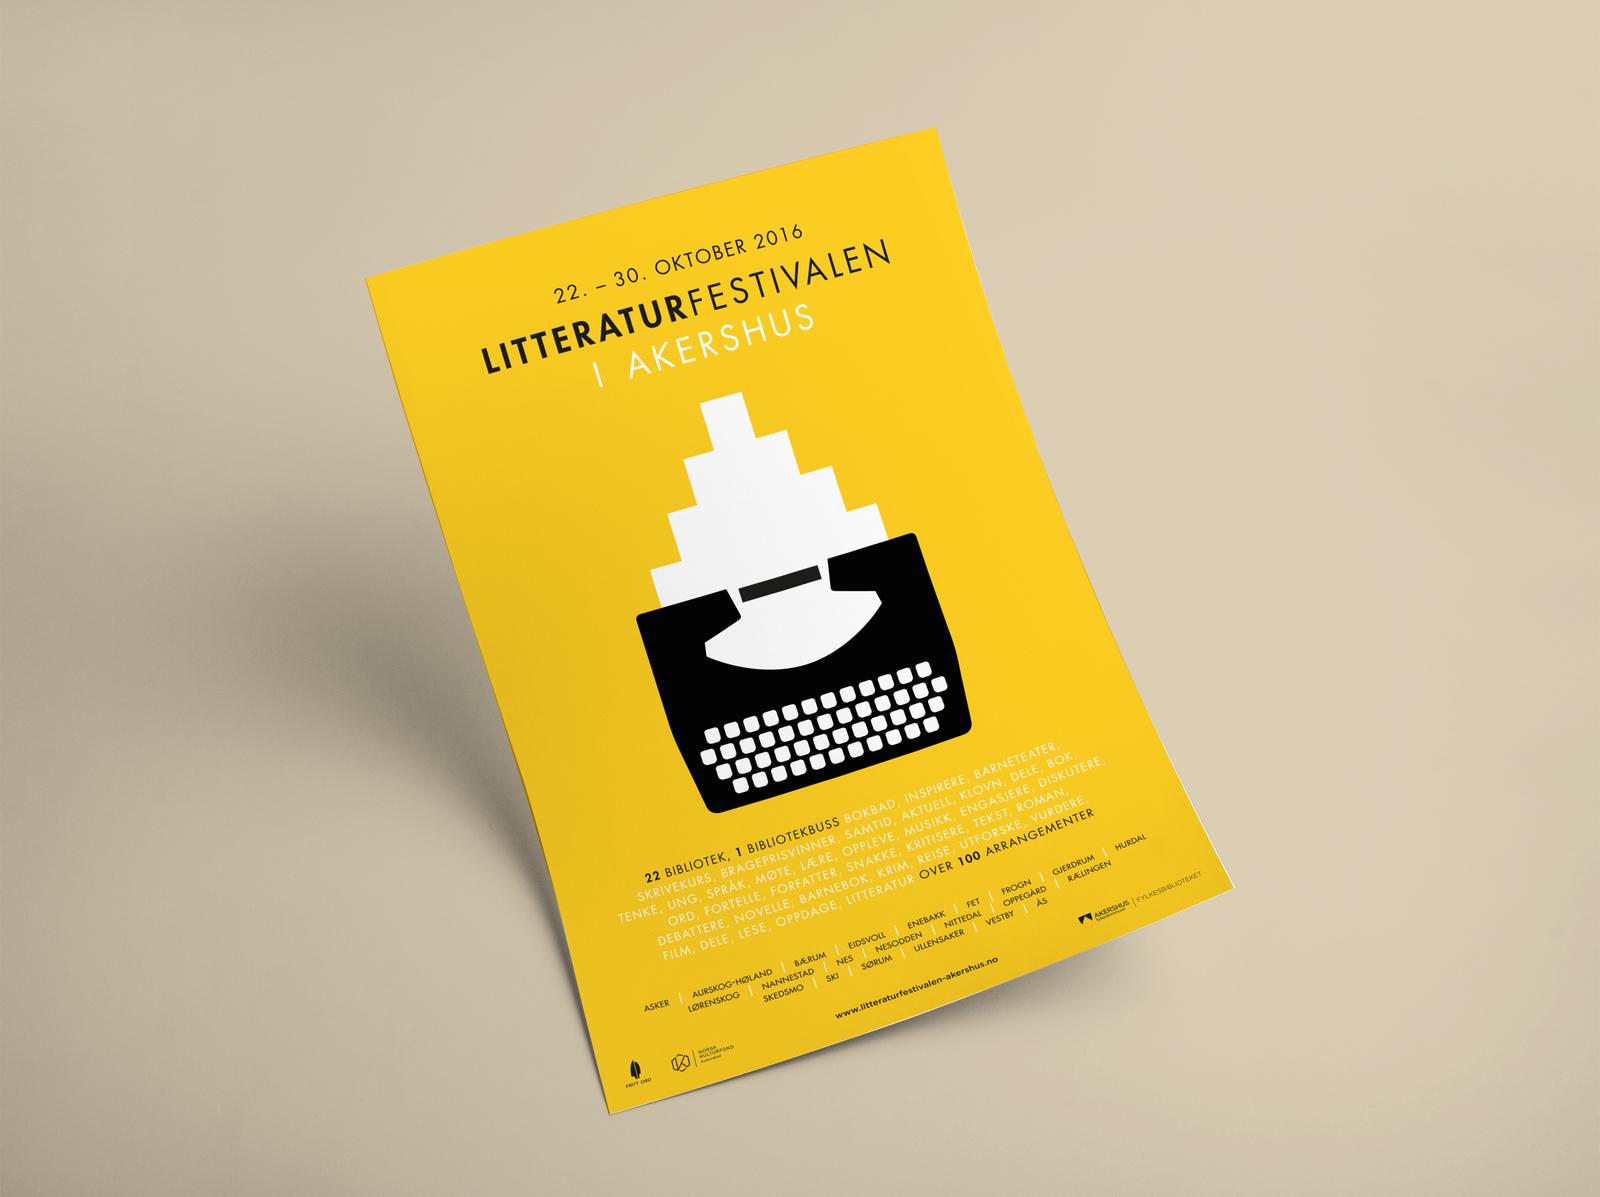 Litteraturfestivalen i Akershus